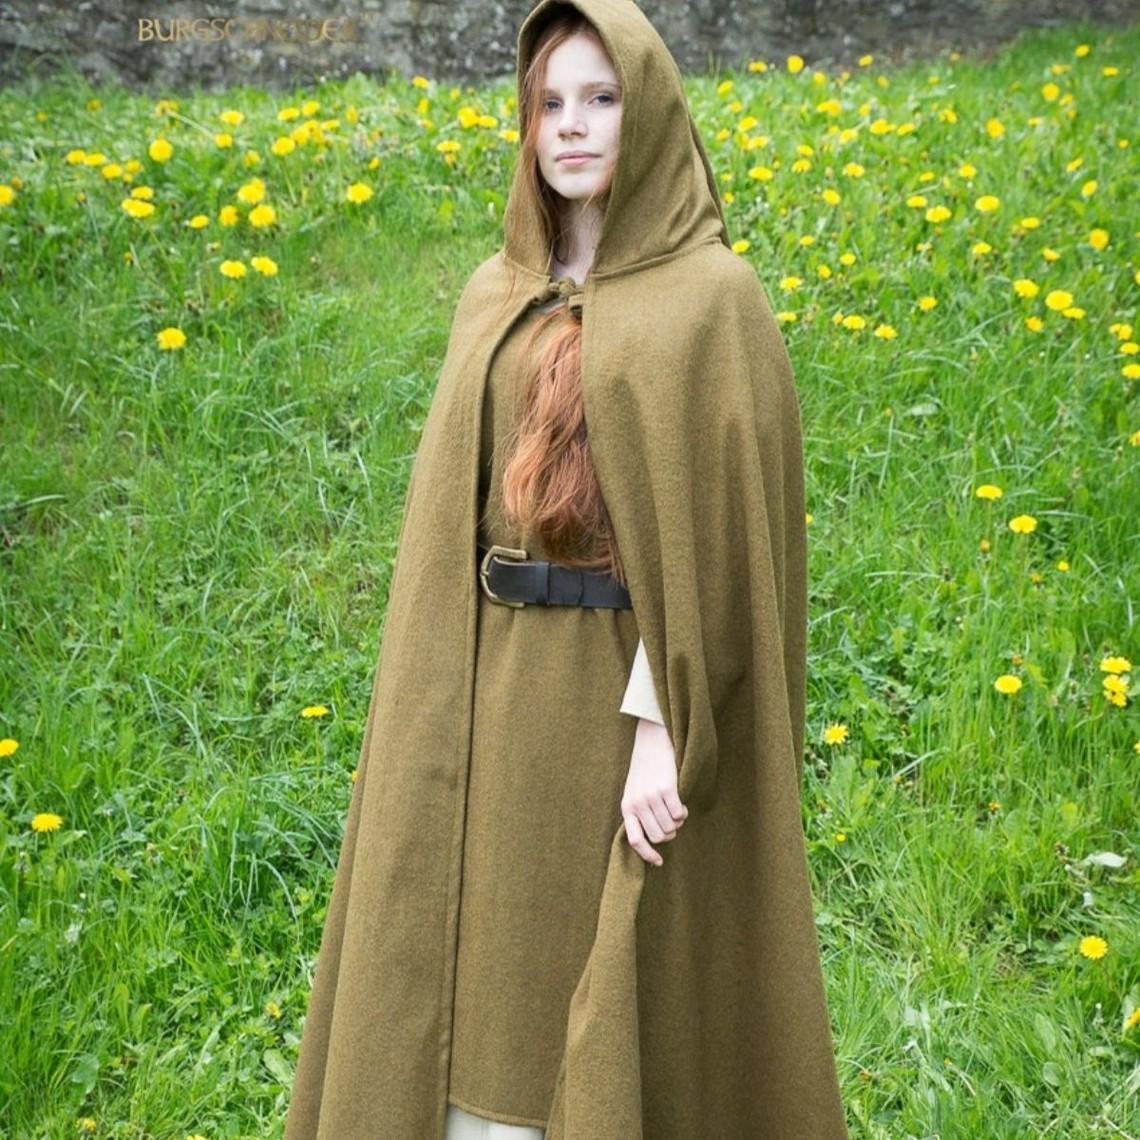 Burgschneider Cloak Hibernus, autumn green